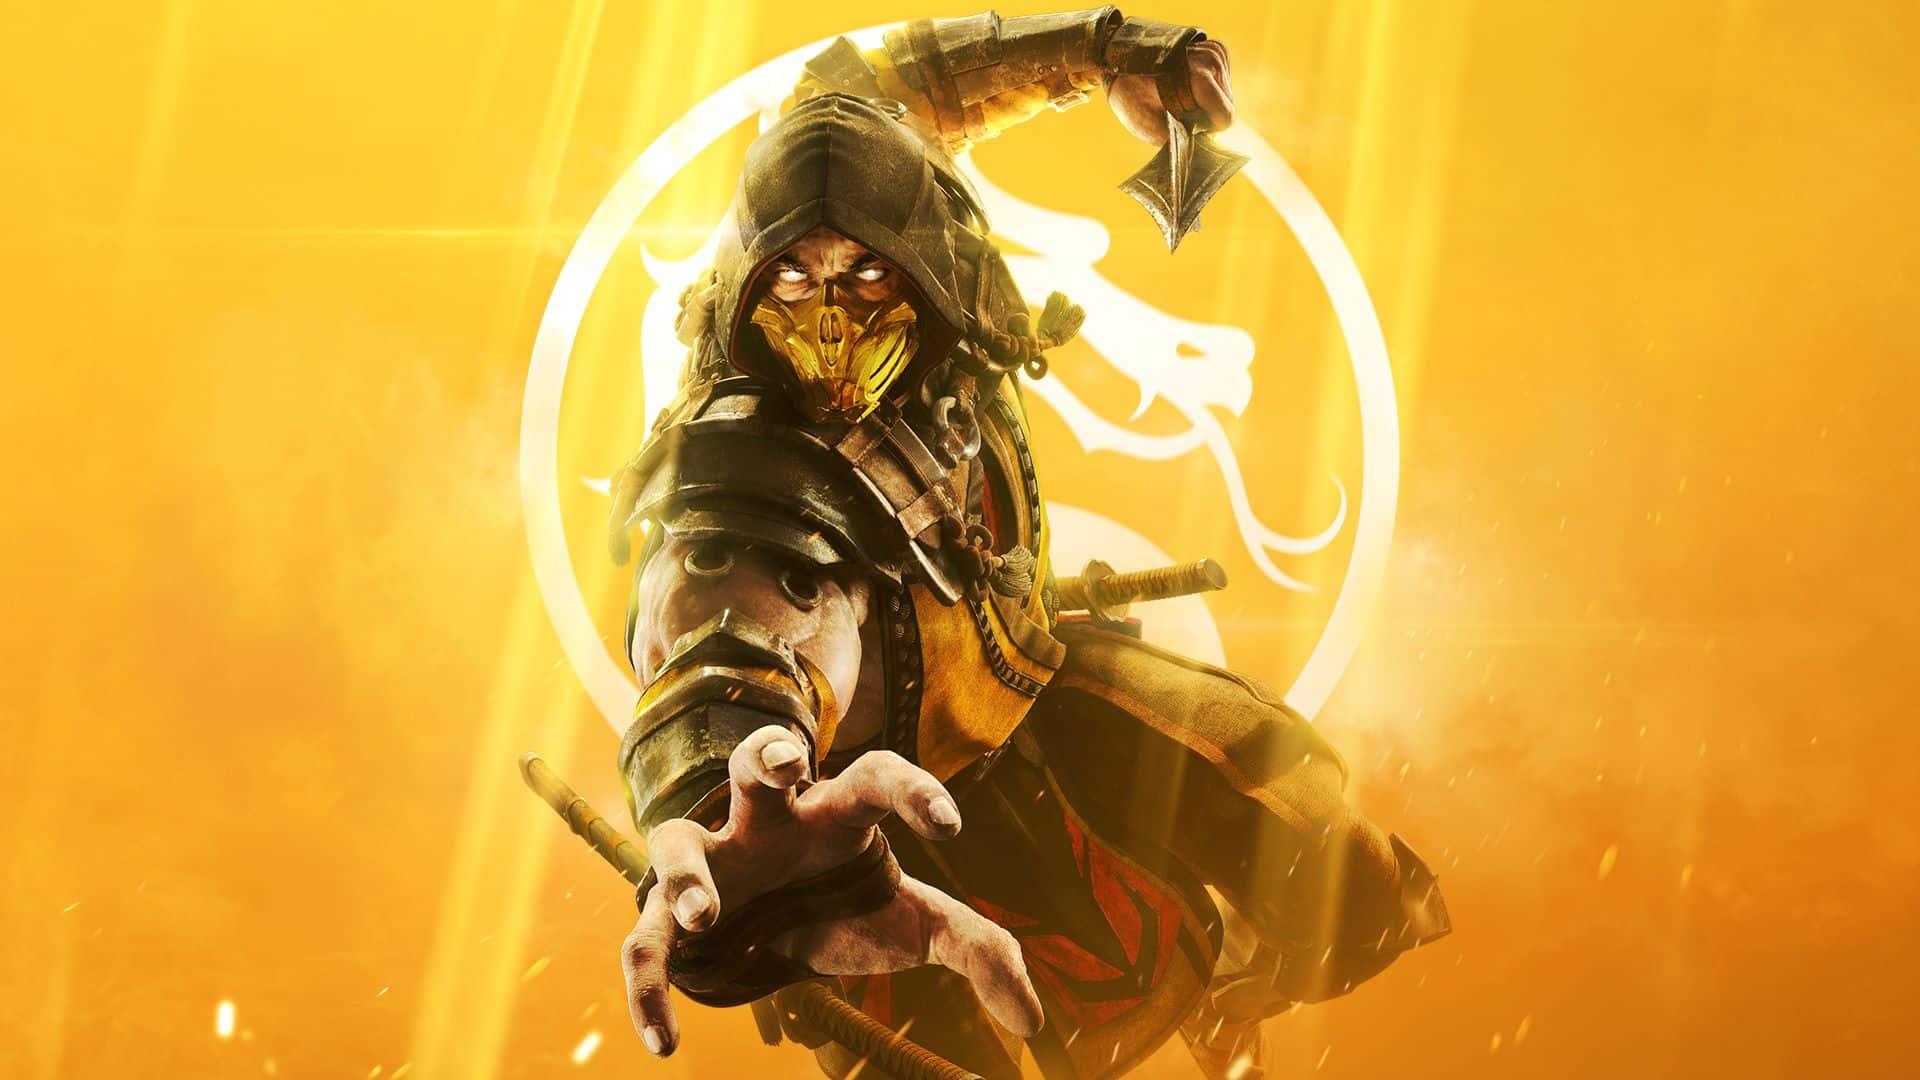 Mortal Kombat 11 Steam Price